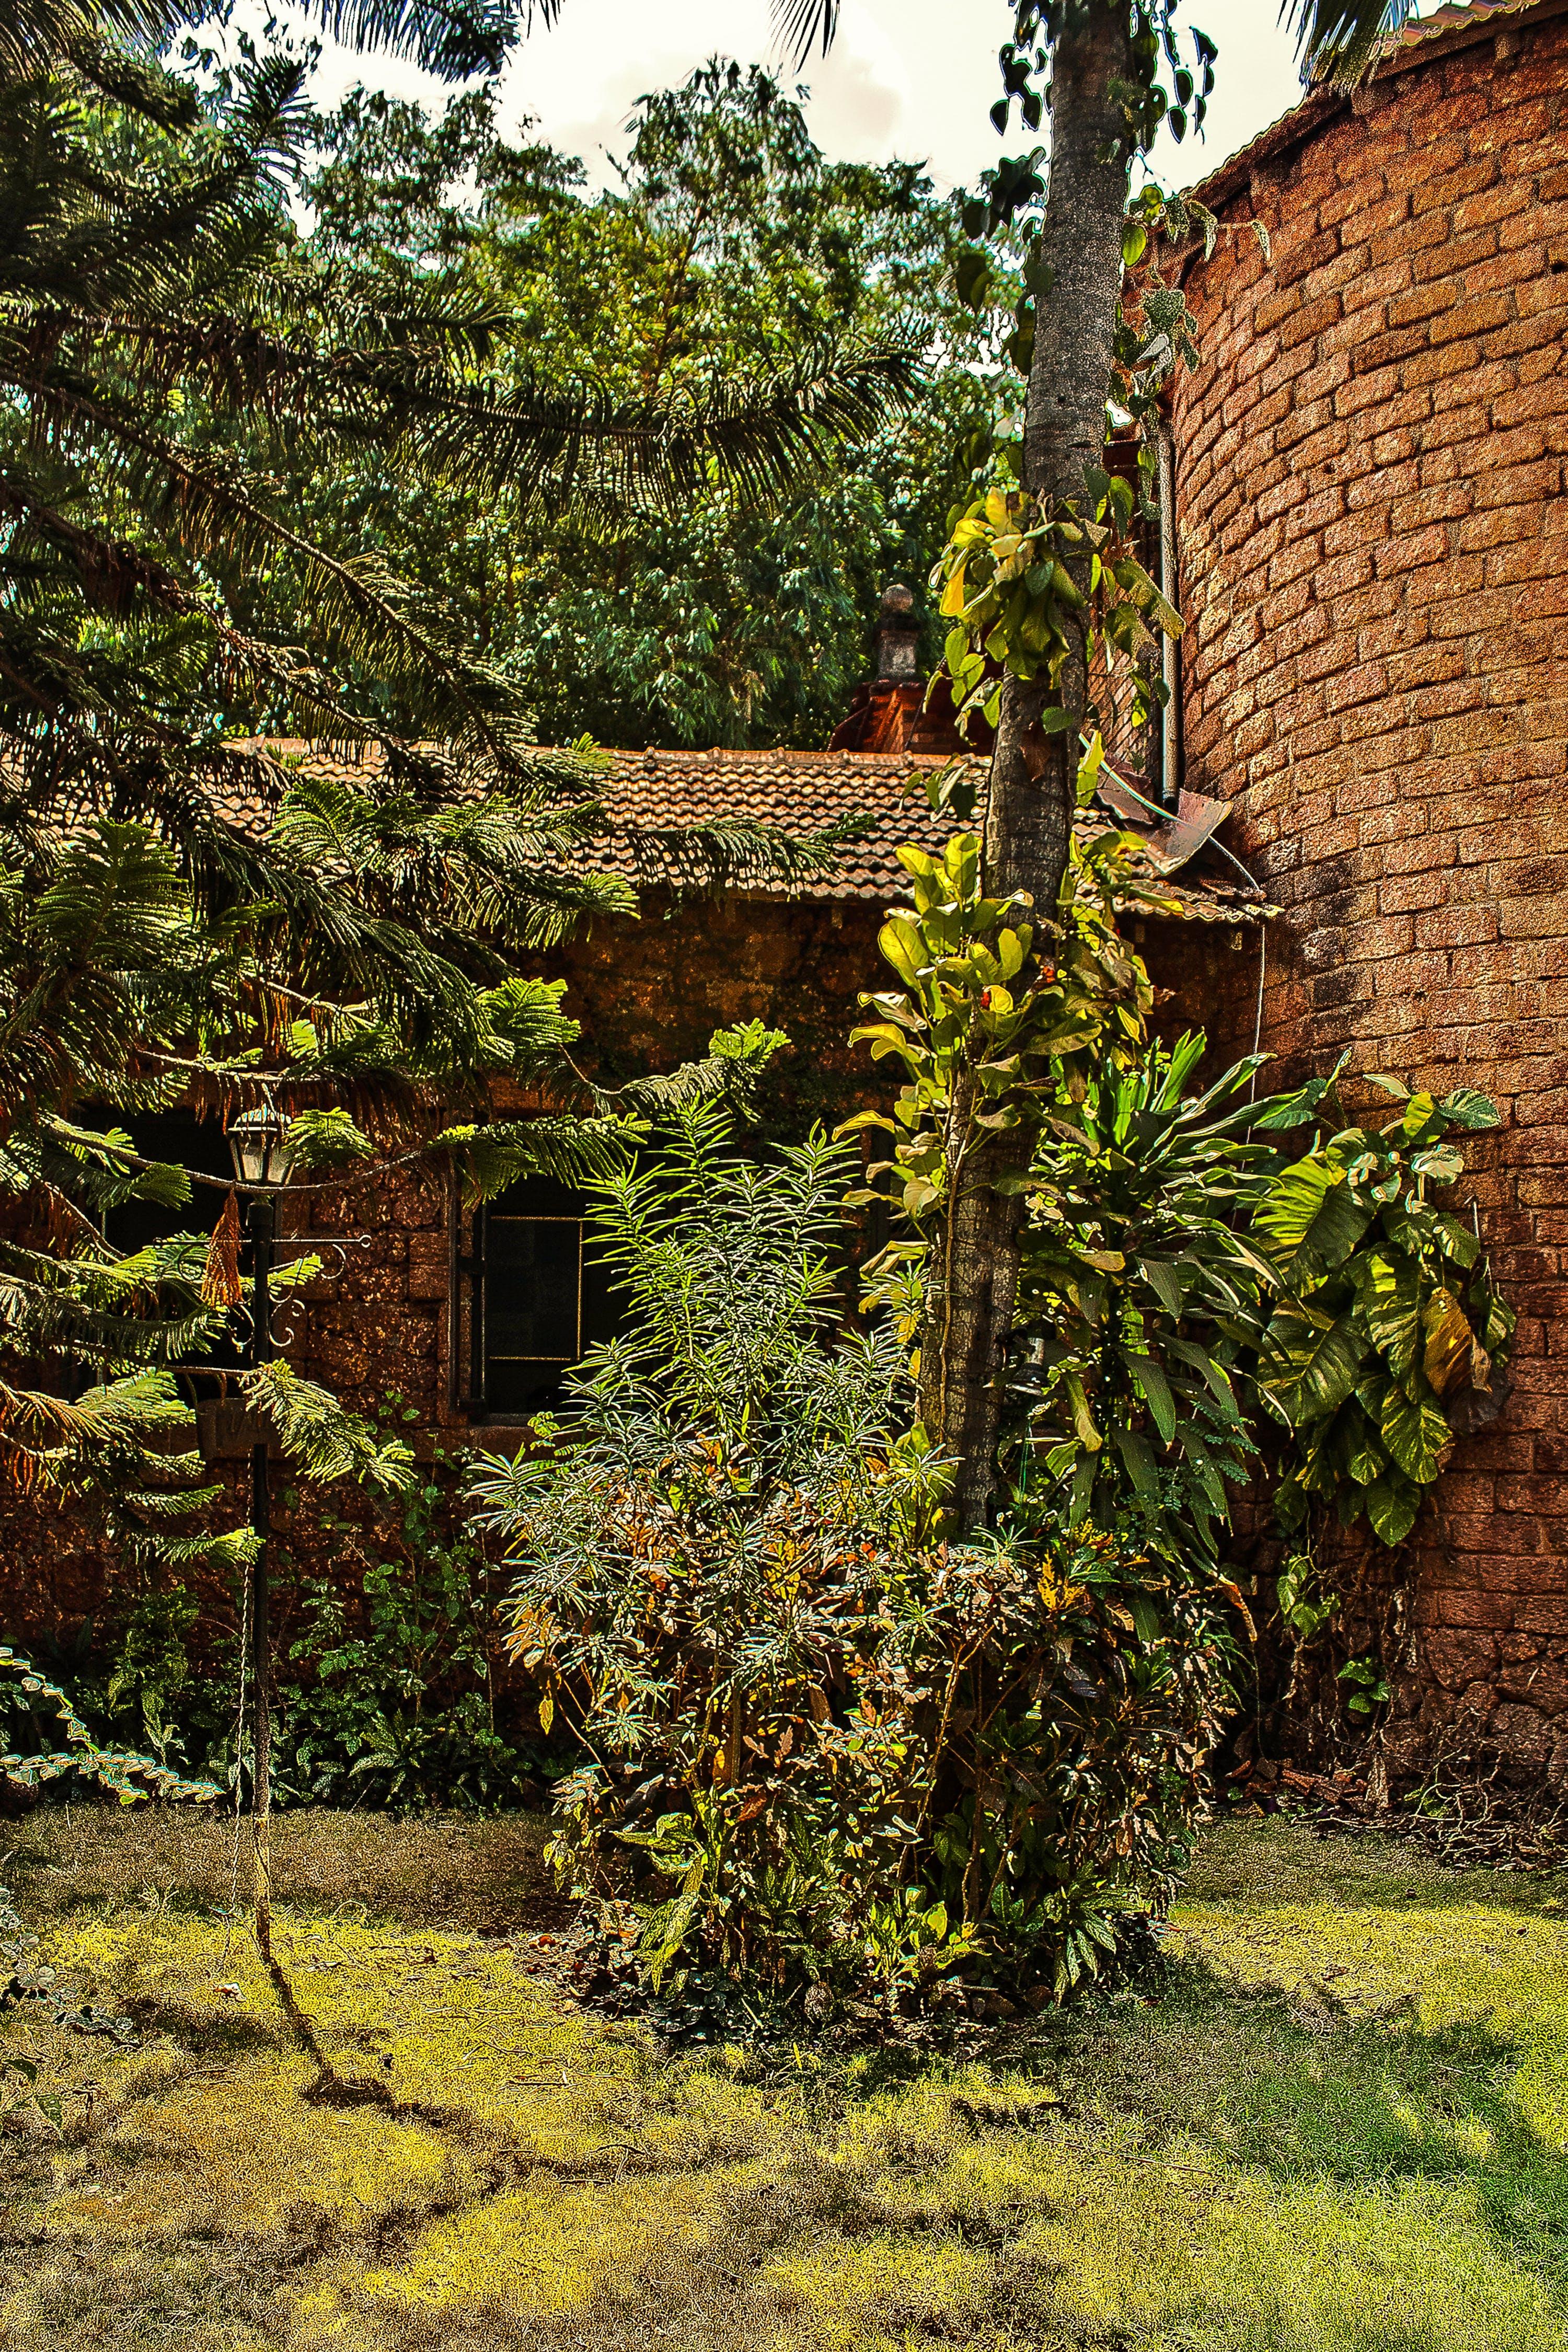 Free stock photo of garden, House in Goa